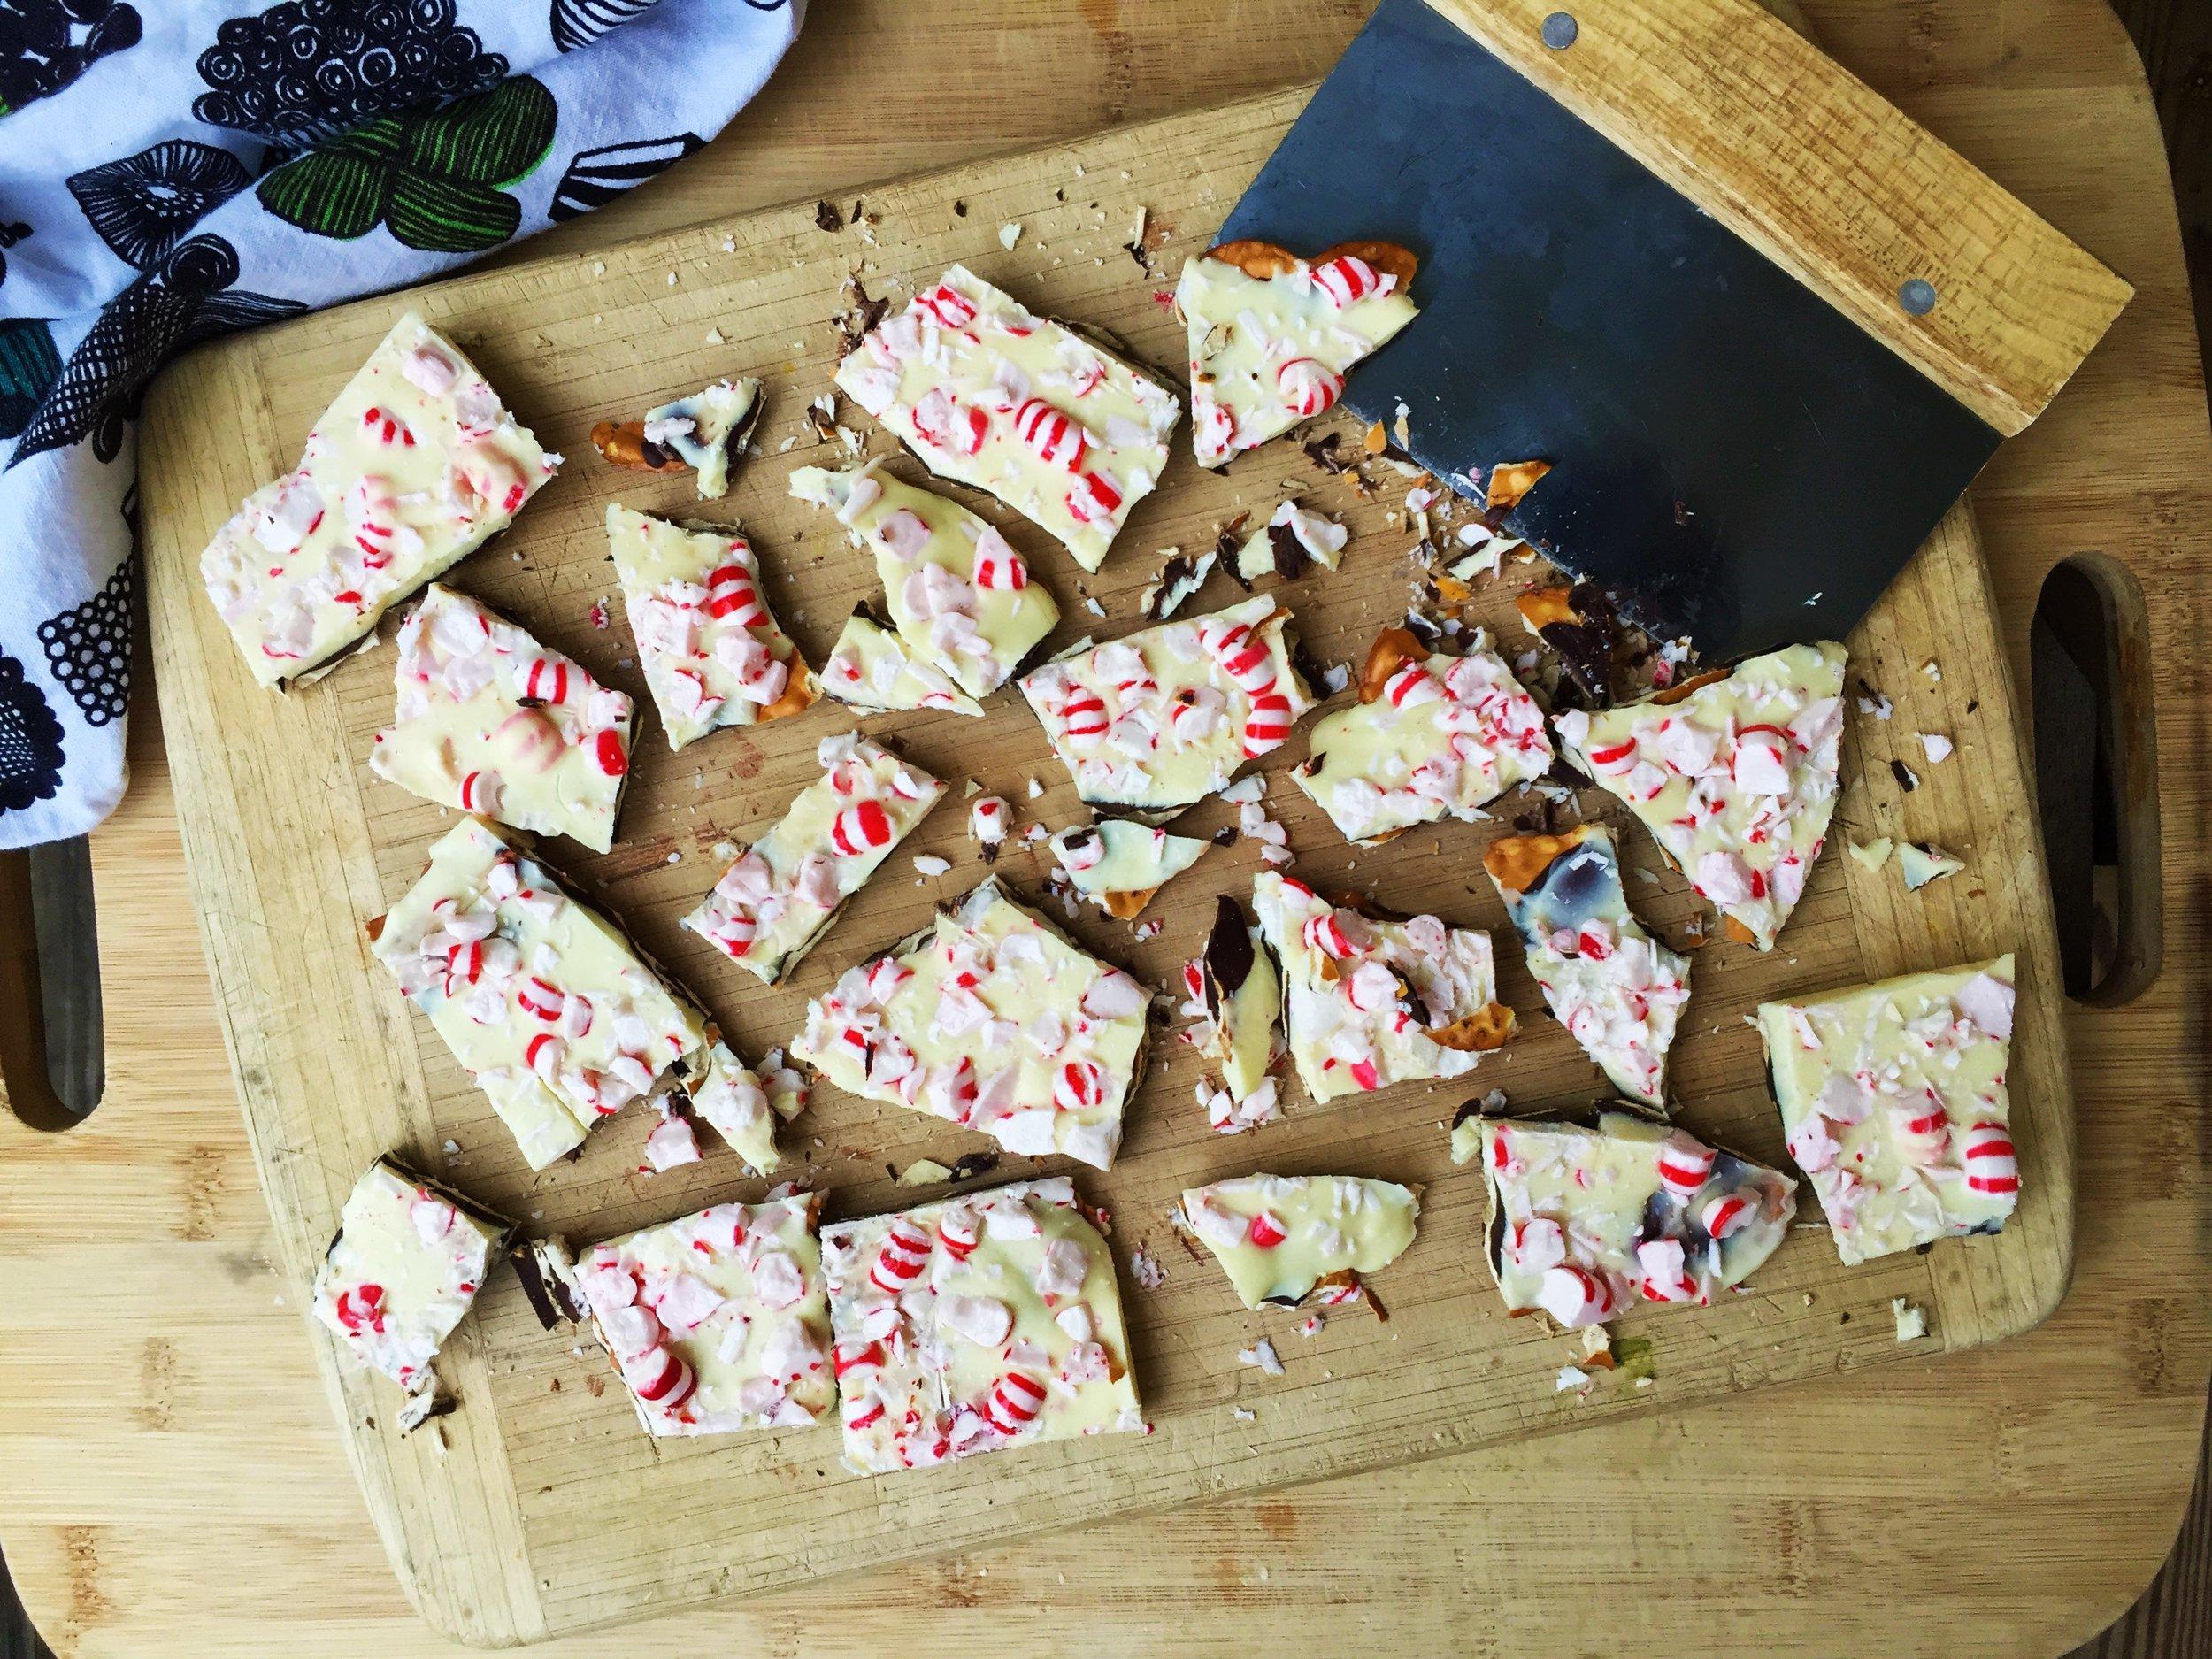 Peppermint Pretzel Bark broken into pieces on a cutting board